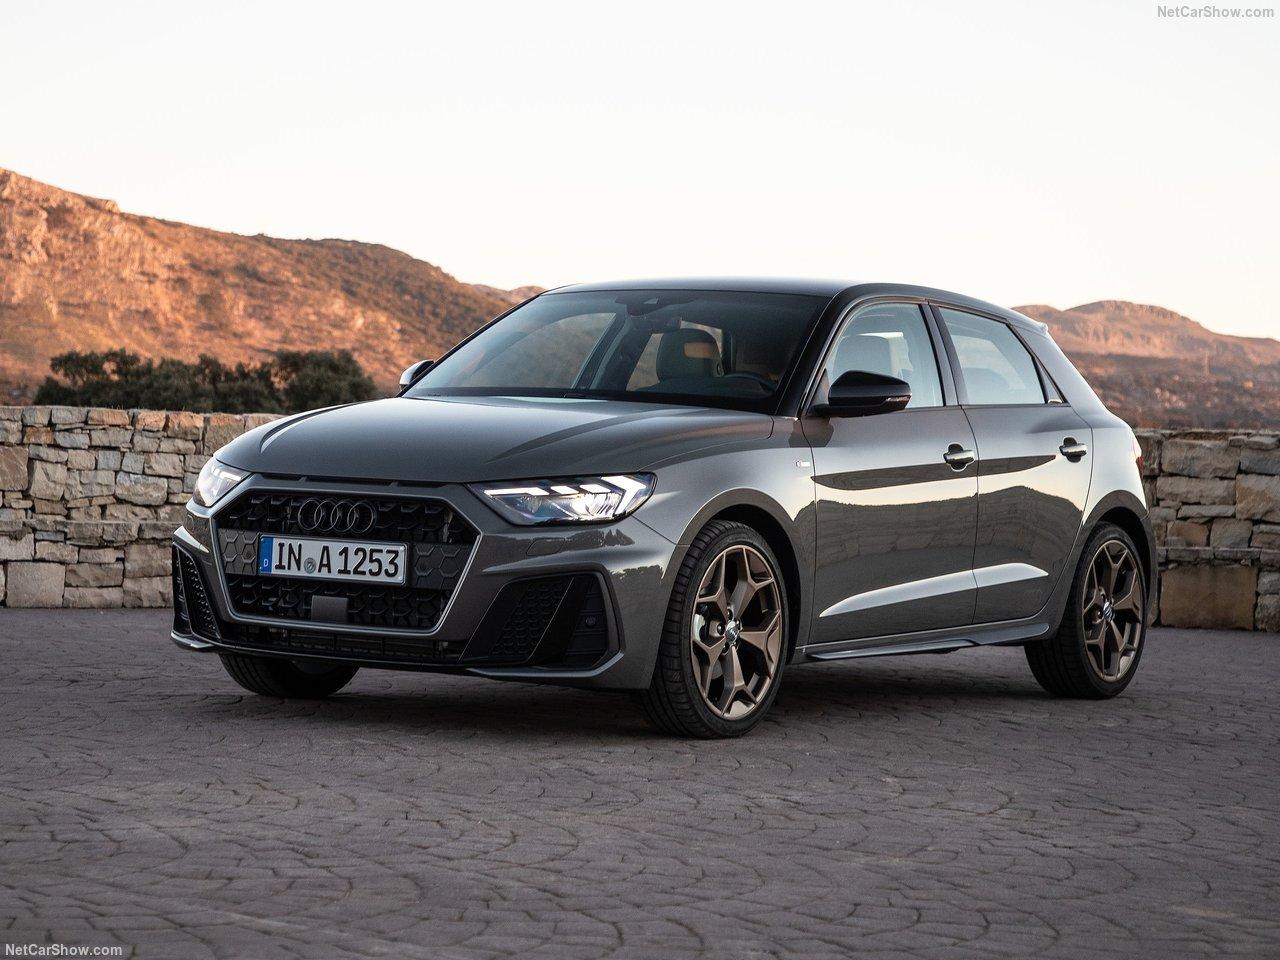 Audi-A1_Sportback-2019-1280-05 (1)